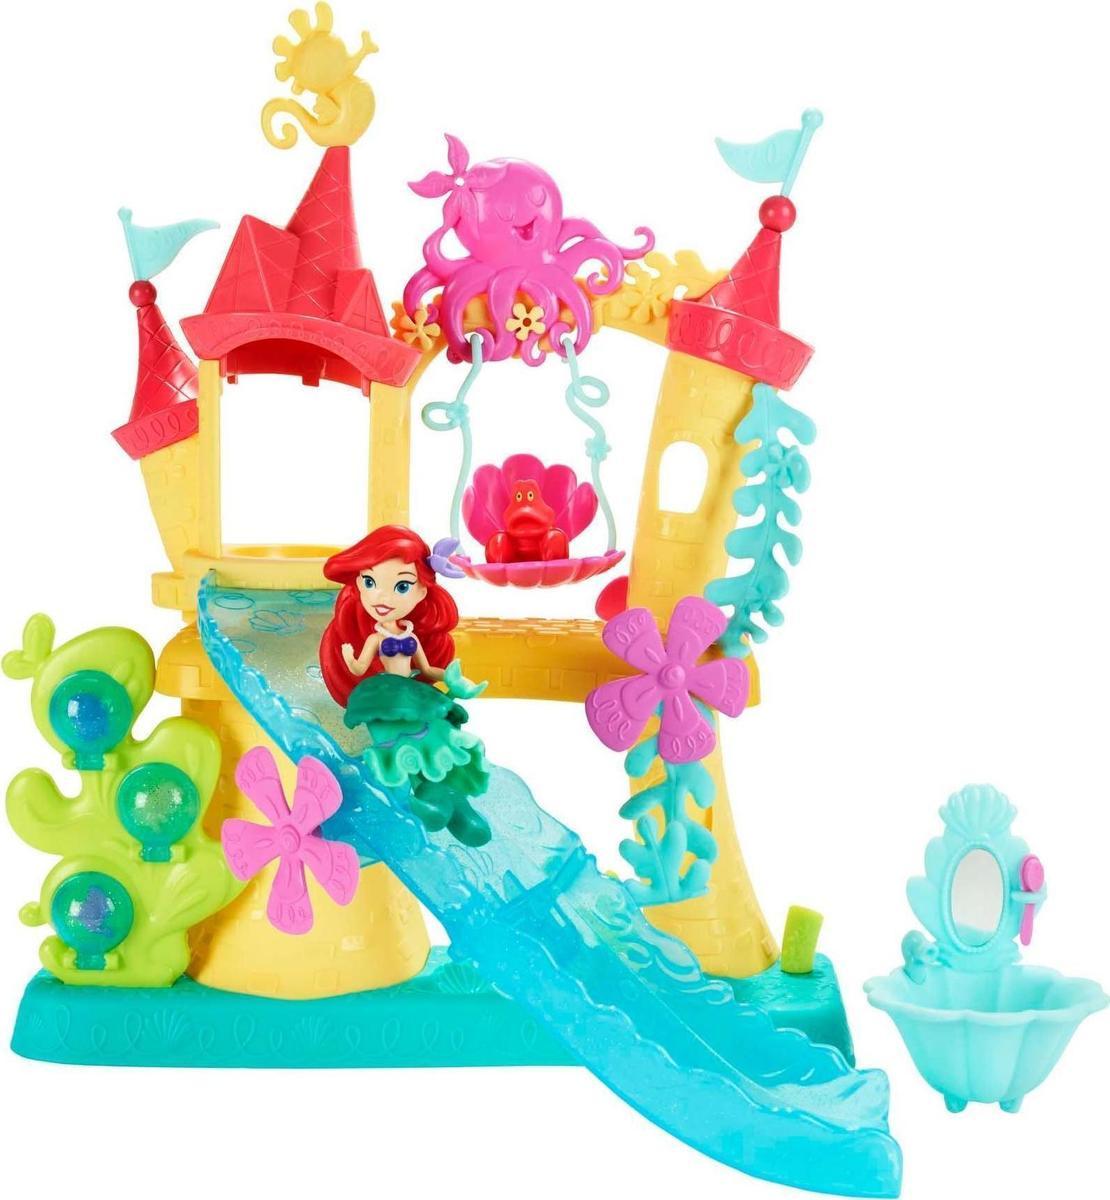 5a8c7e2d7c6 Προσθήκη στα αγαπημένα menu Hasbro Disney Princess Little Kingdom Ariel's  Sea Castle